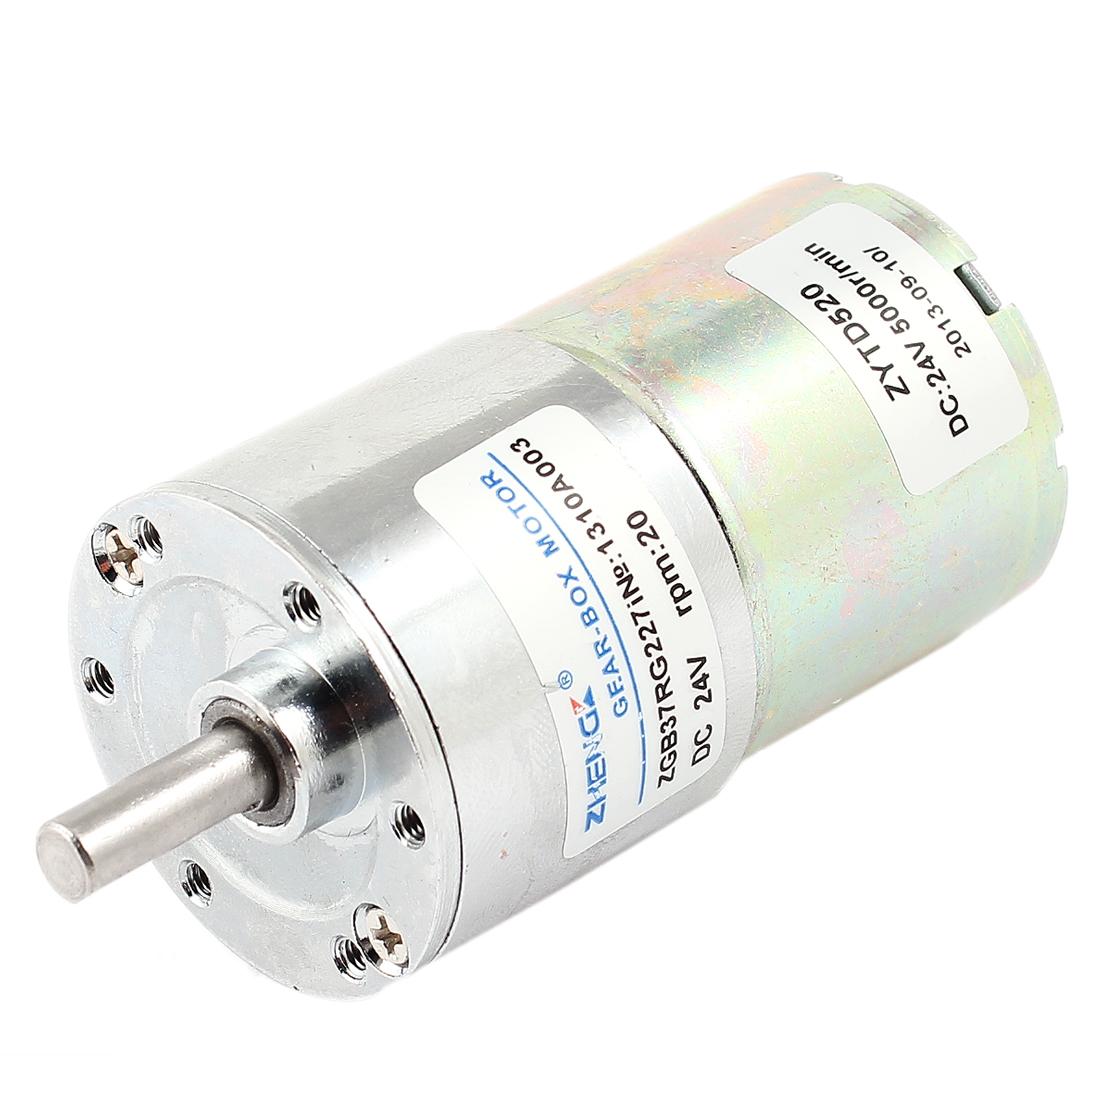 DC 24V 0.33A 13kg.cm Torque 37mm Dia Magnetic Gear Box Motor 20 RPM